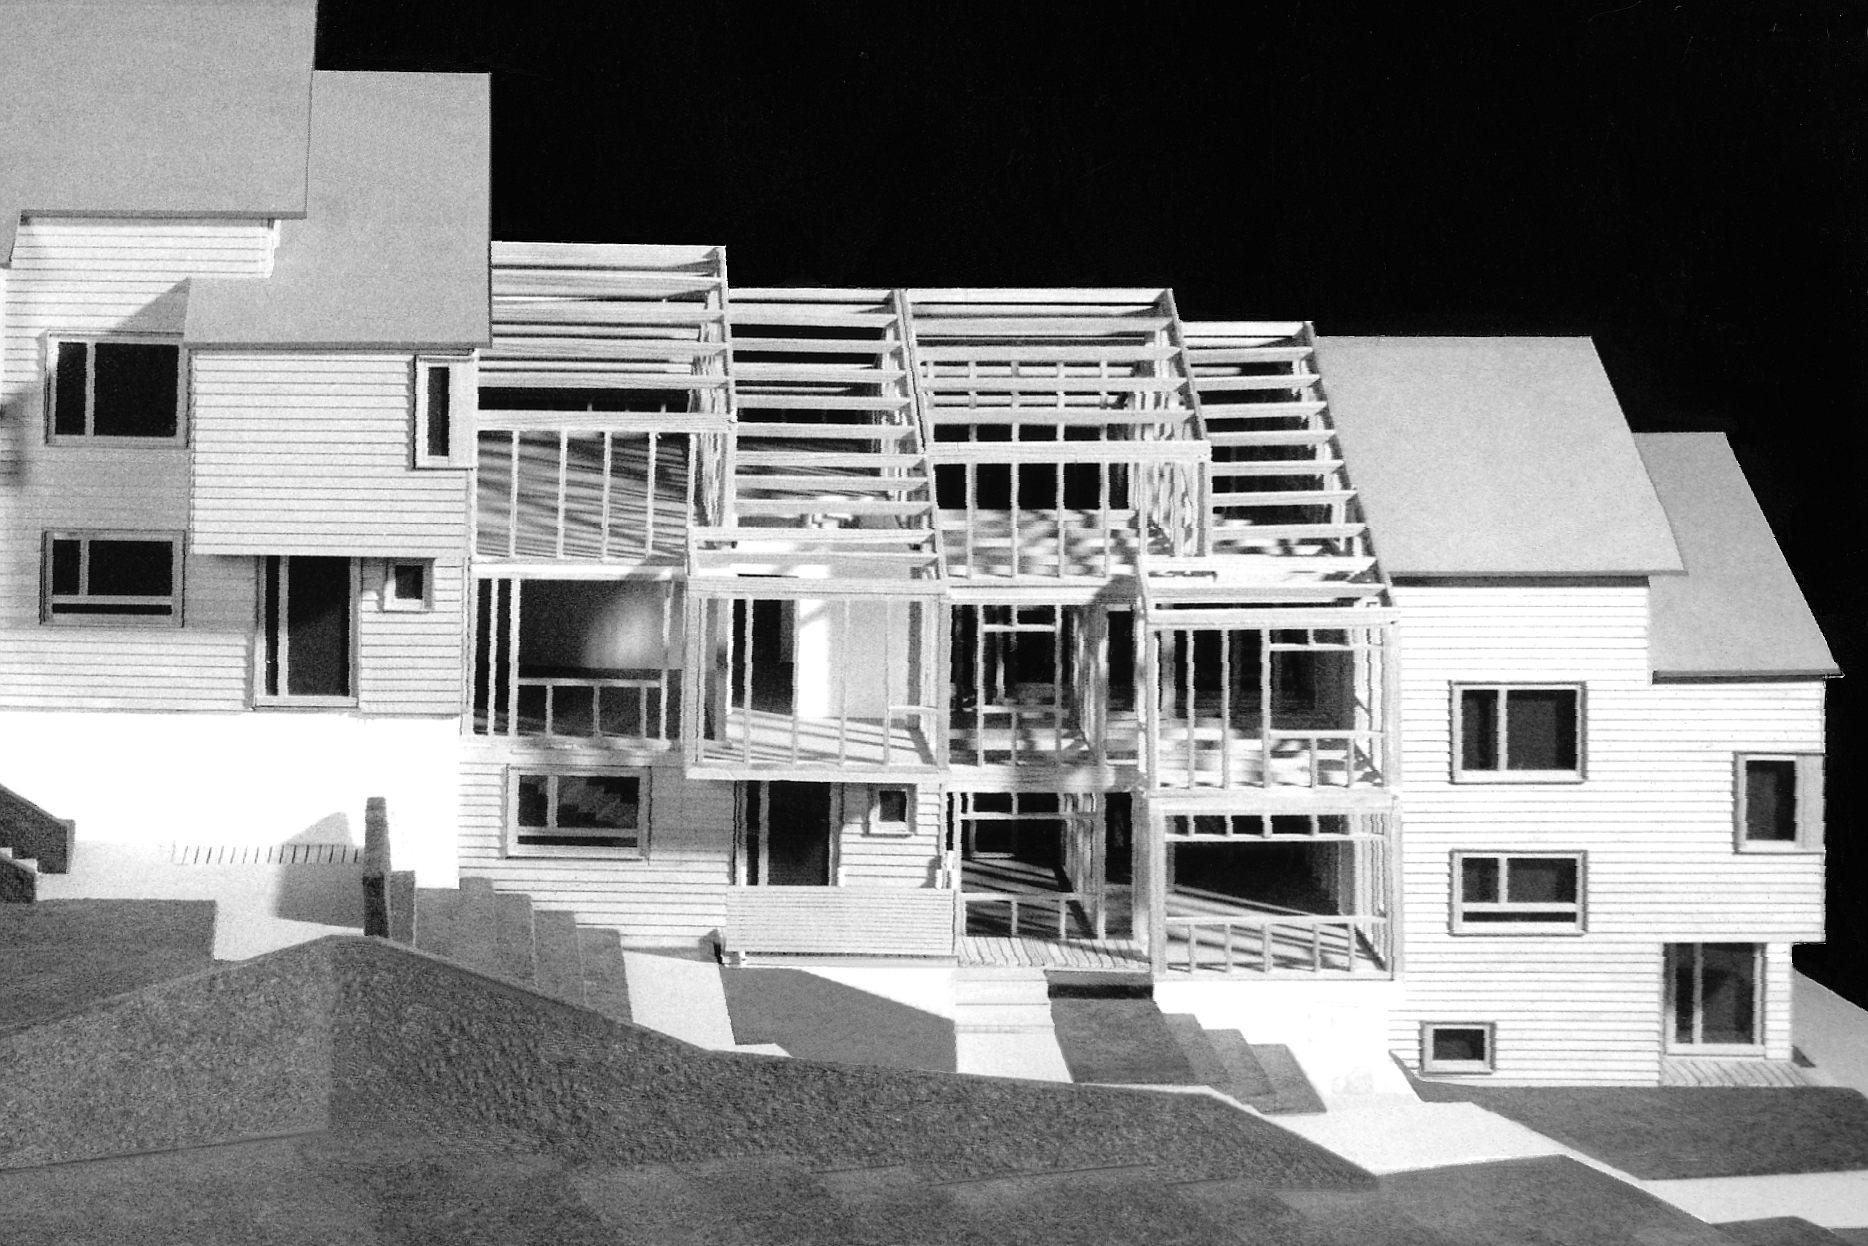 neuartige Holzrahmenkonstruktion